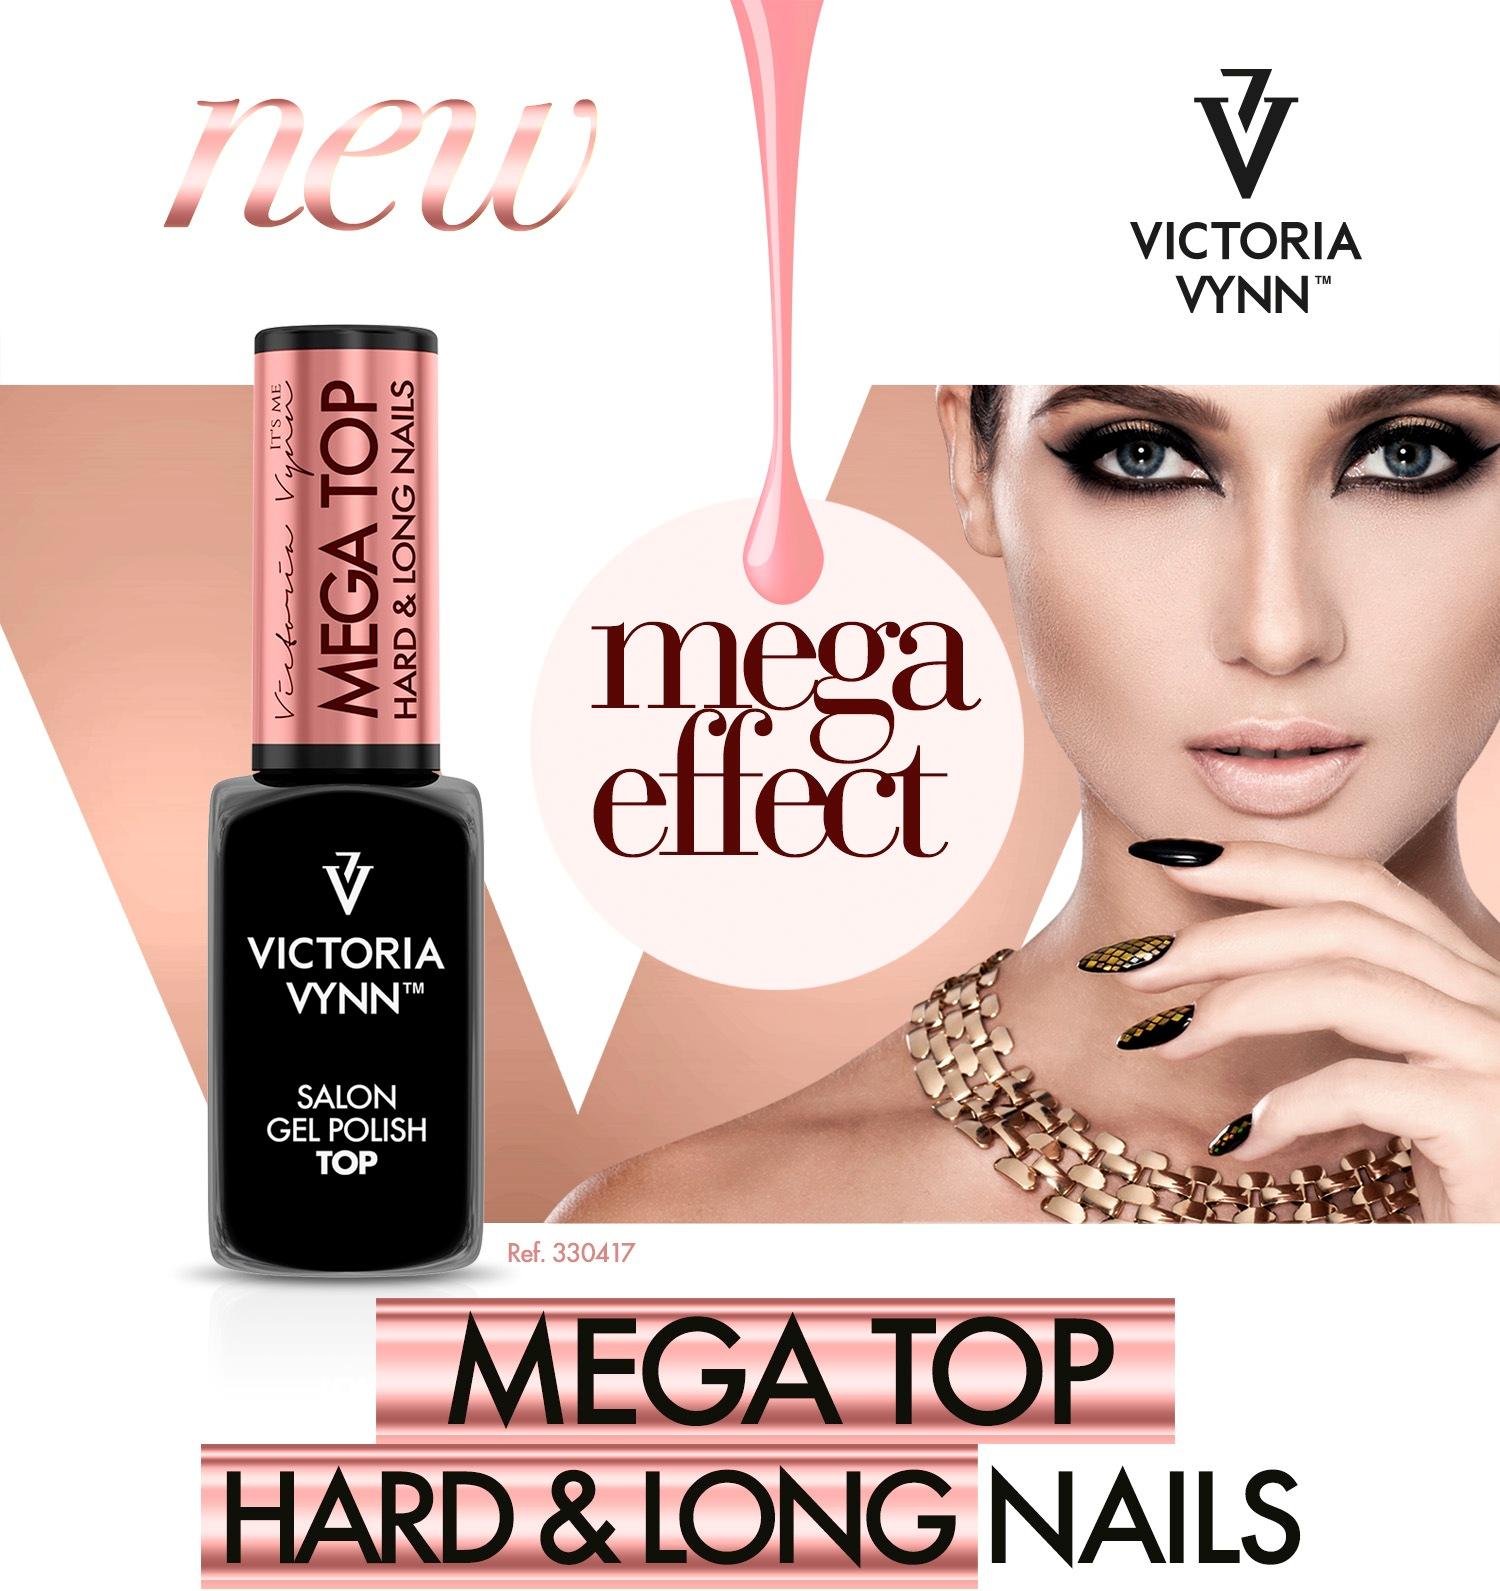 Mega Top da Victoria Vynn